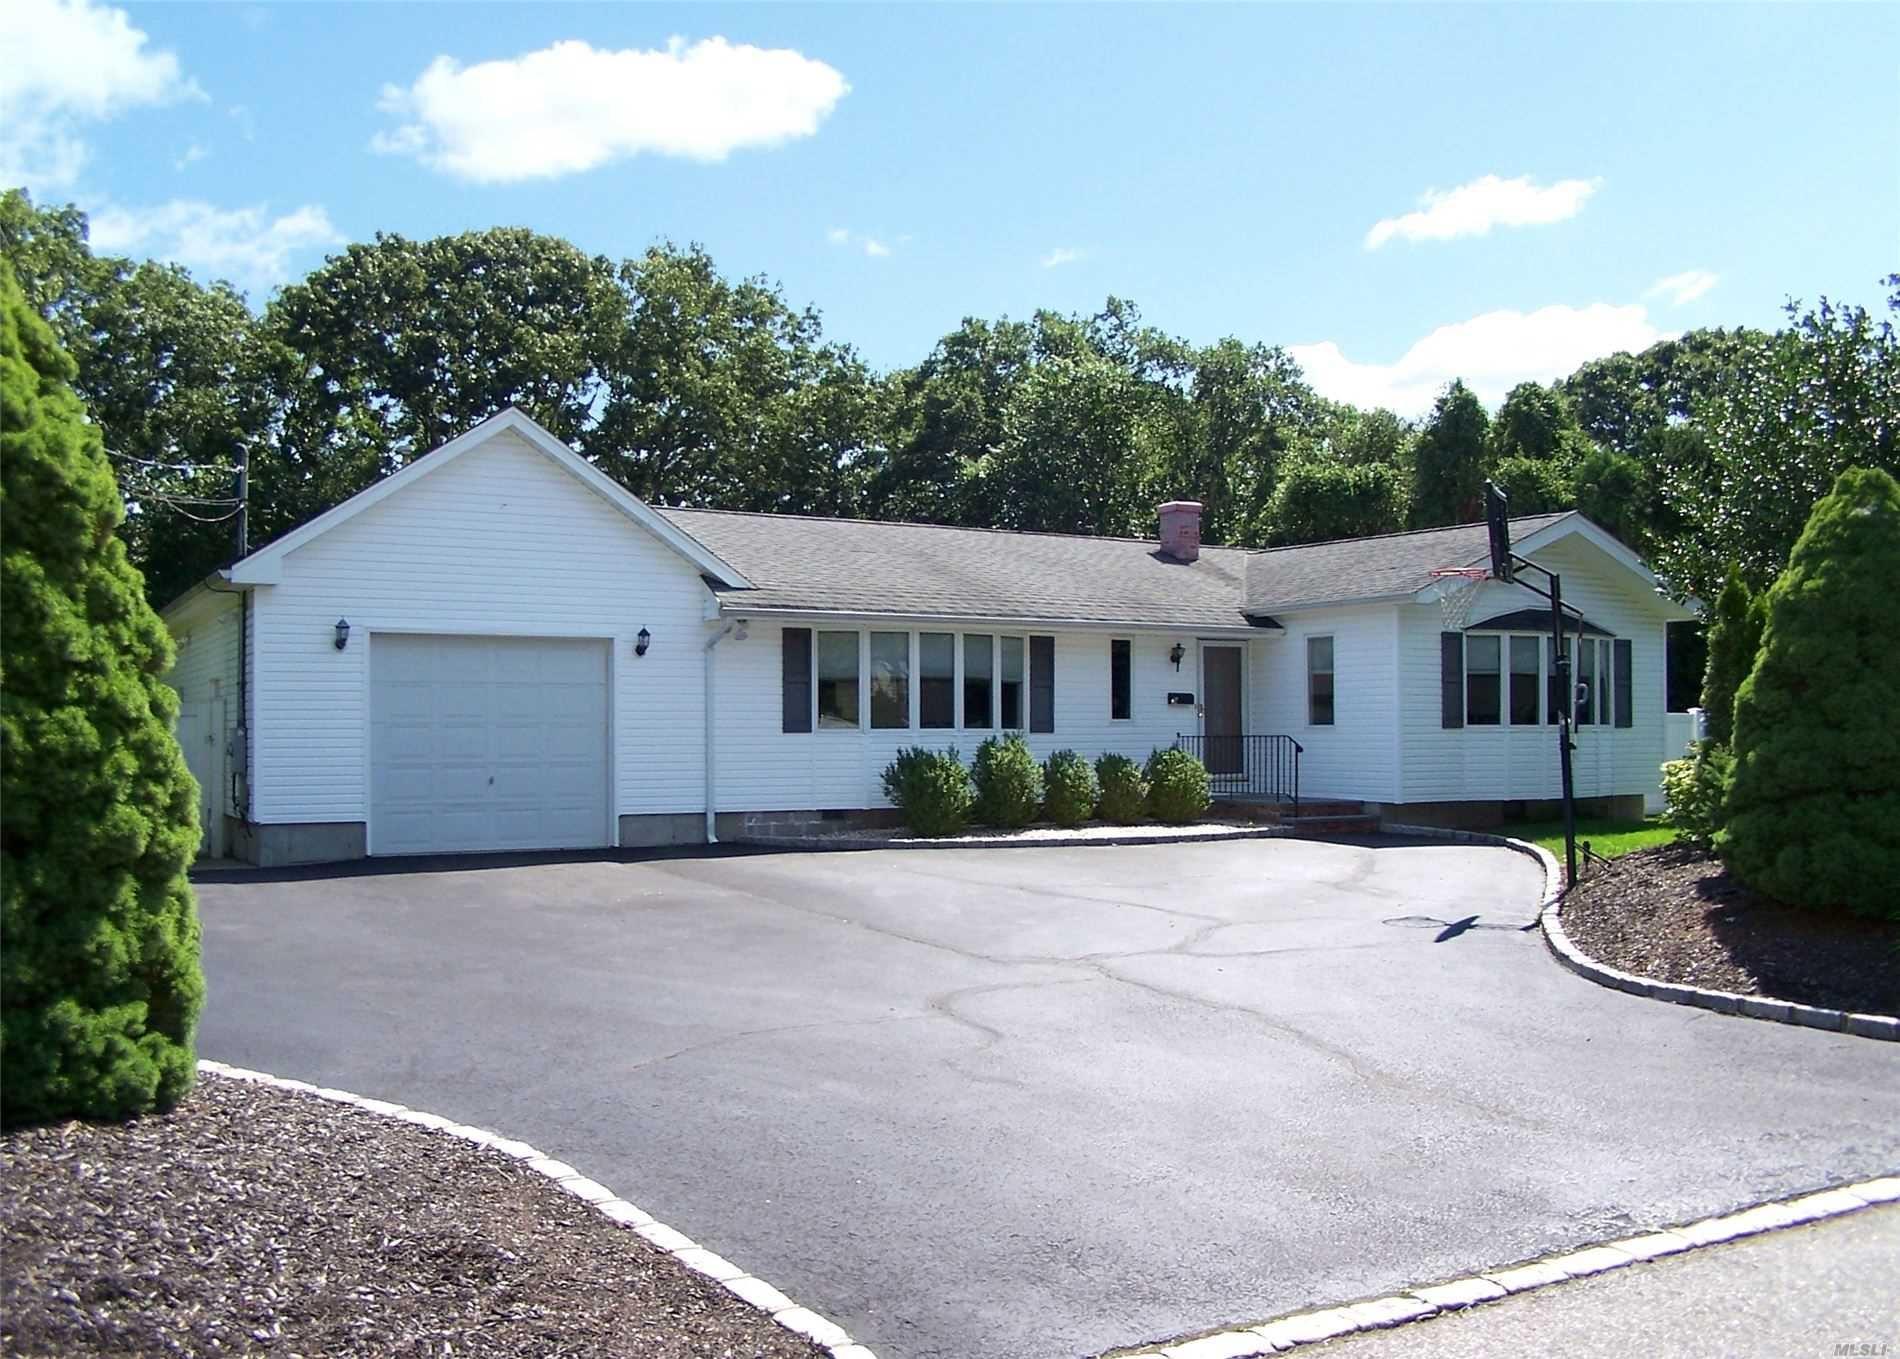 92 E Fawn Lane, Brookhaven, NY 11720 - MLS#: 3240534